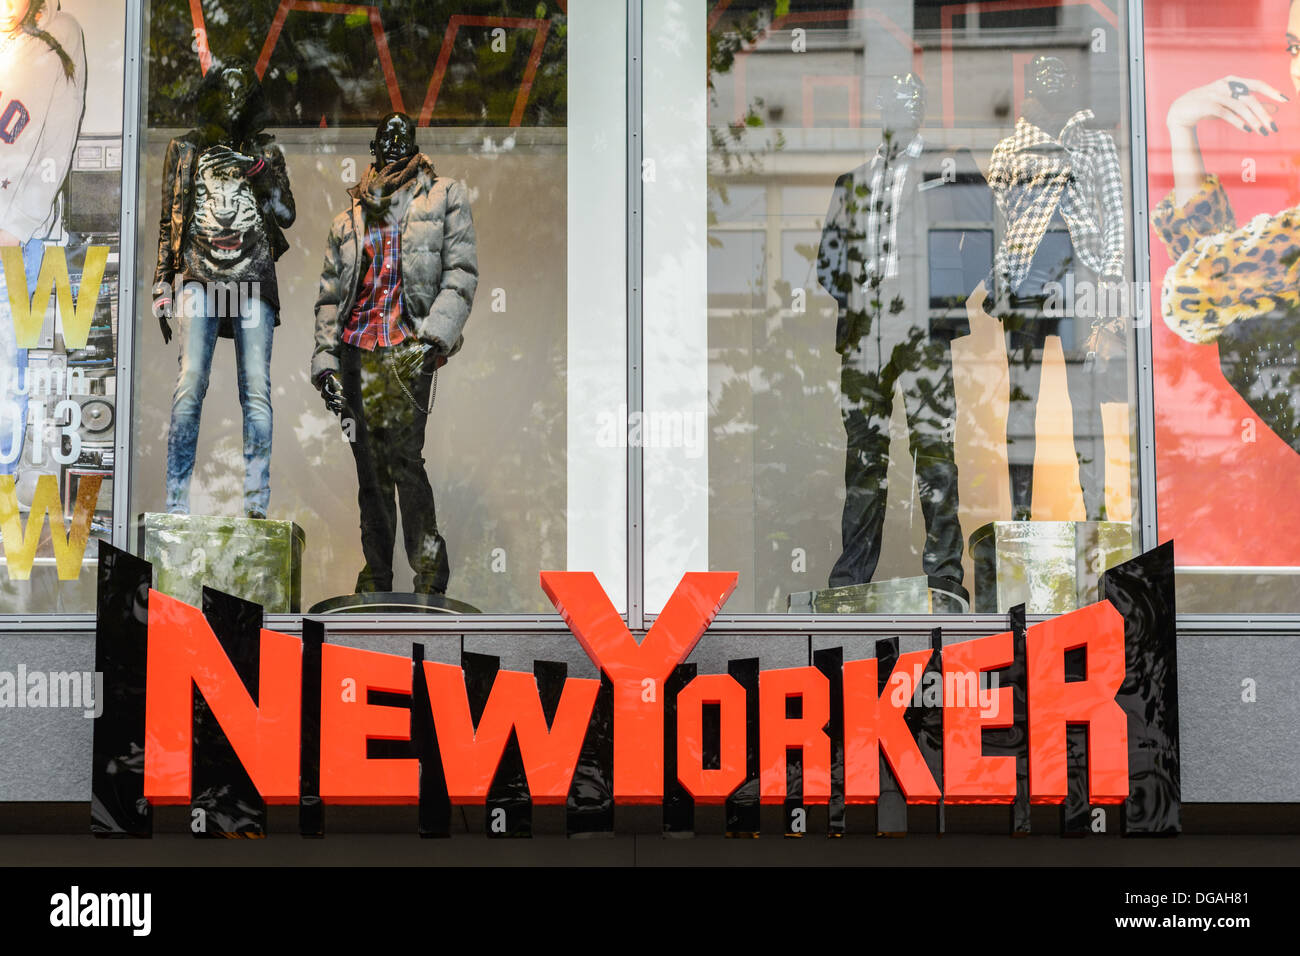 Red illuminated NewYorker company logo sign and shopwindow – international fashion label based in Braunschweig, Stock Photo